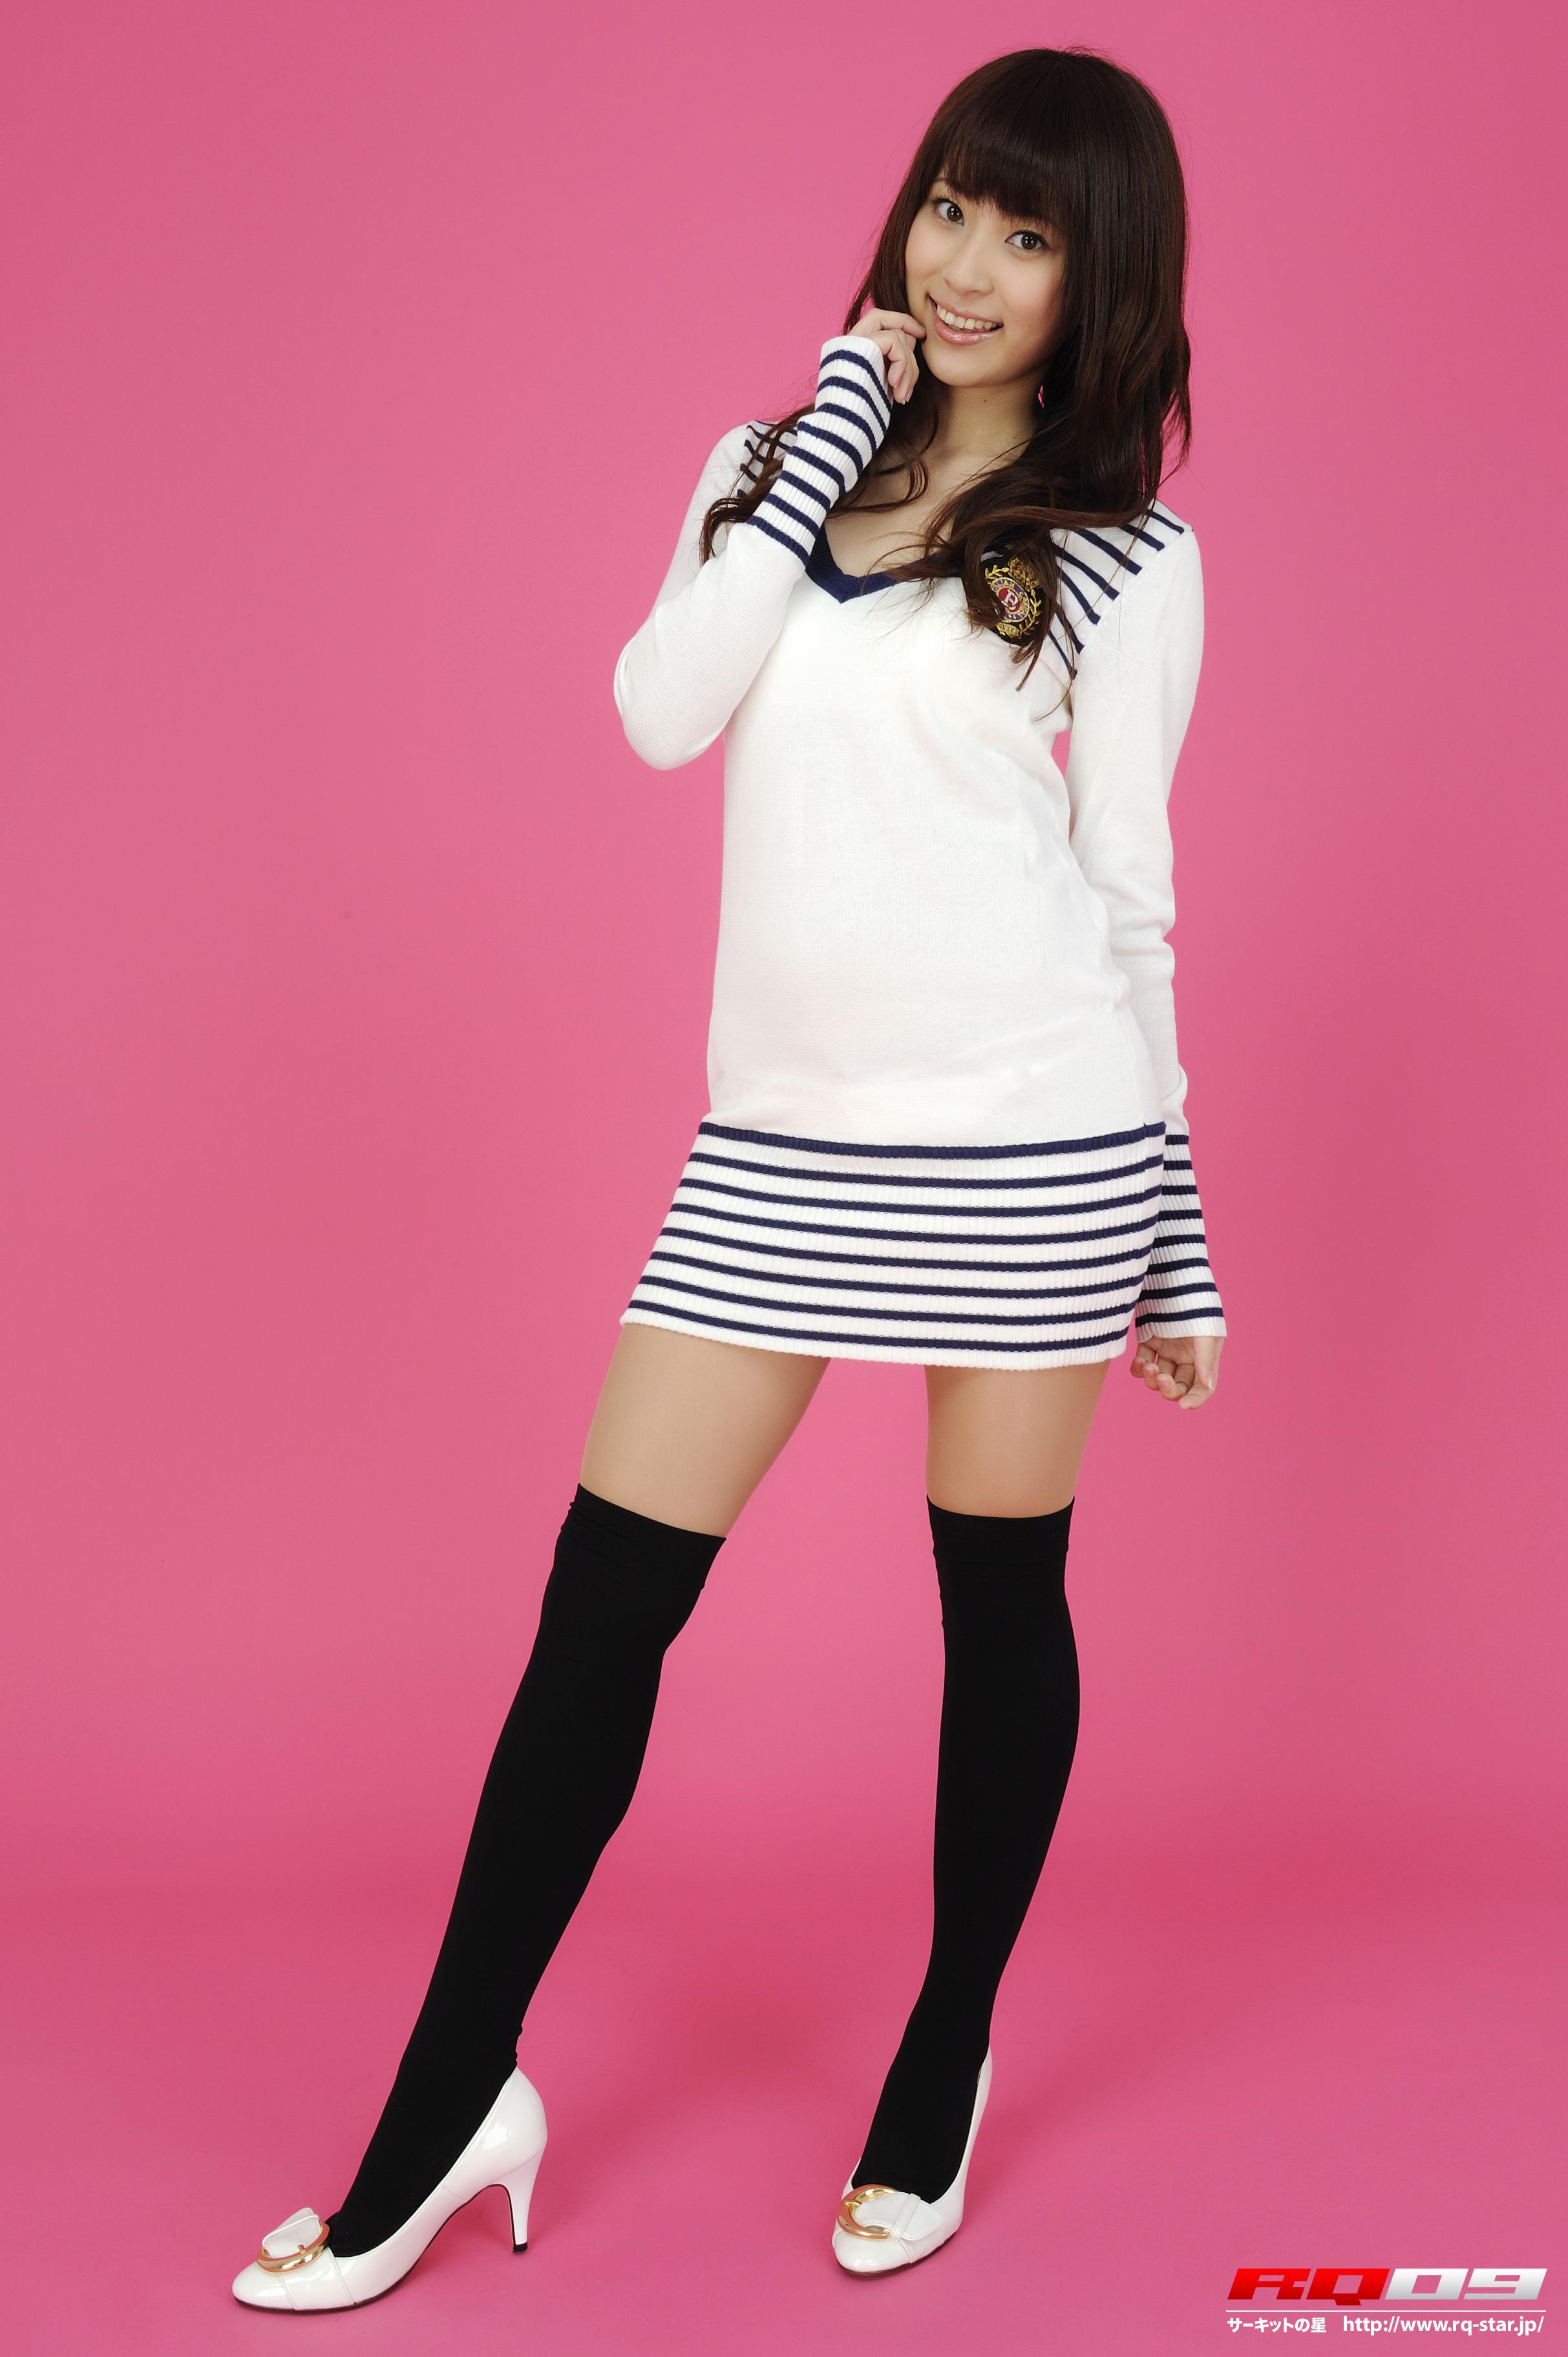 [RQ-STAR写真]NO.00140 林杏菜 Anna Hayashi 白色连衣裙加黑色丝袜美腿性感私房写真集